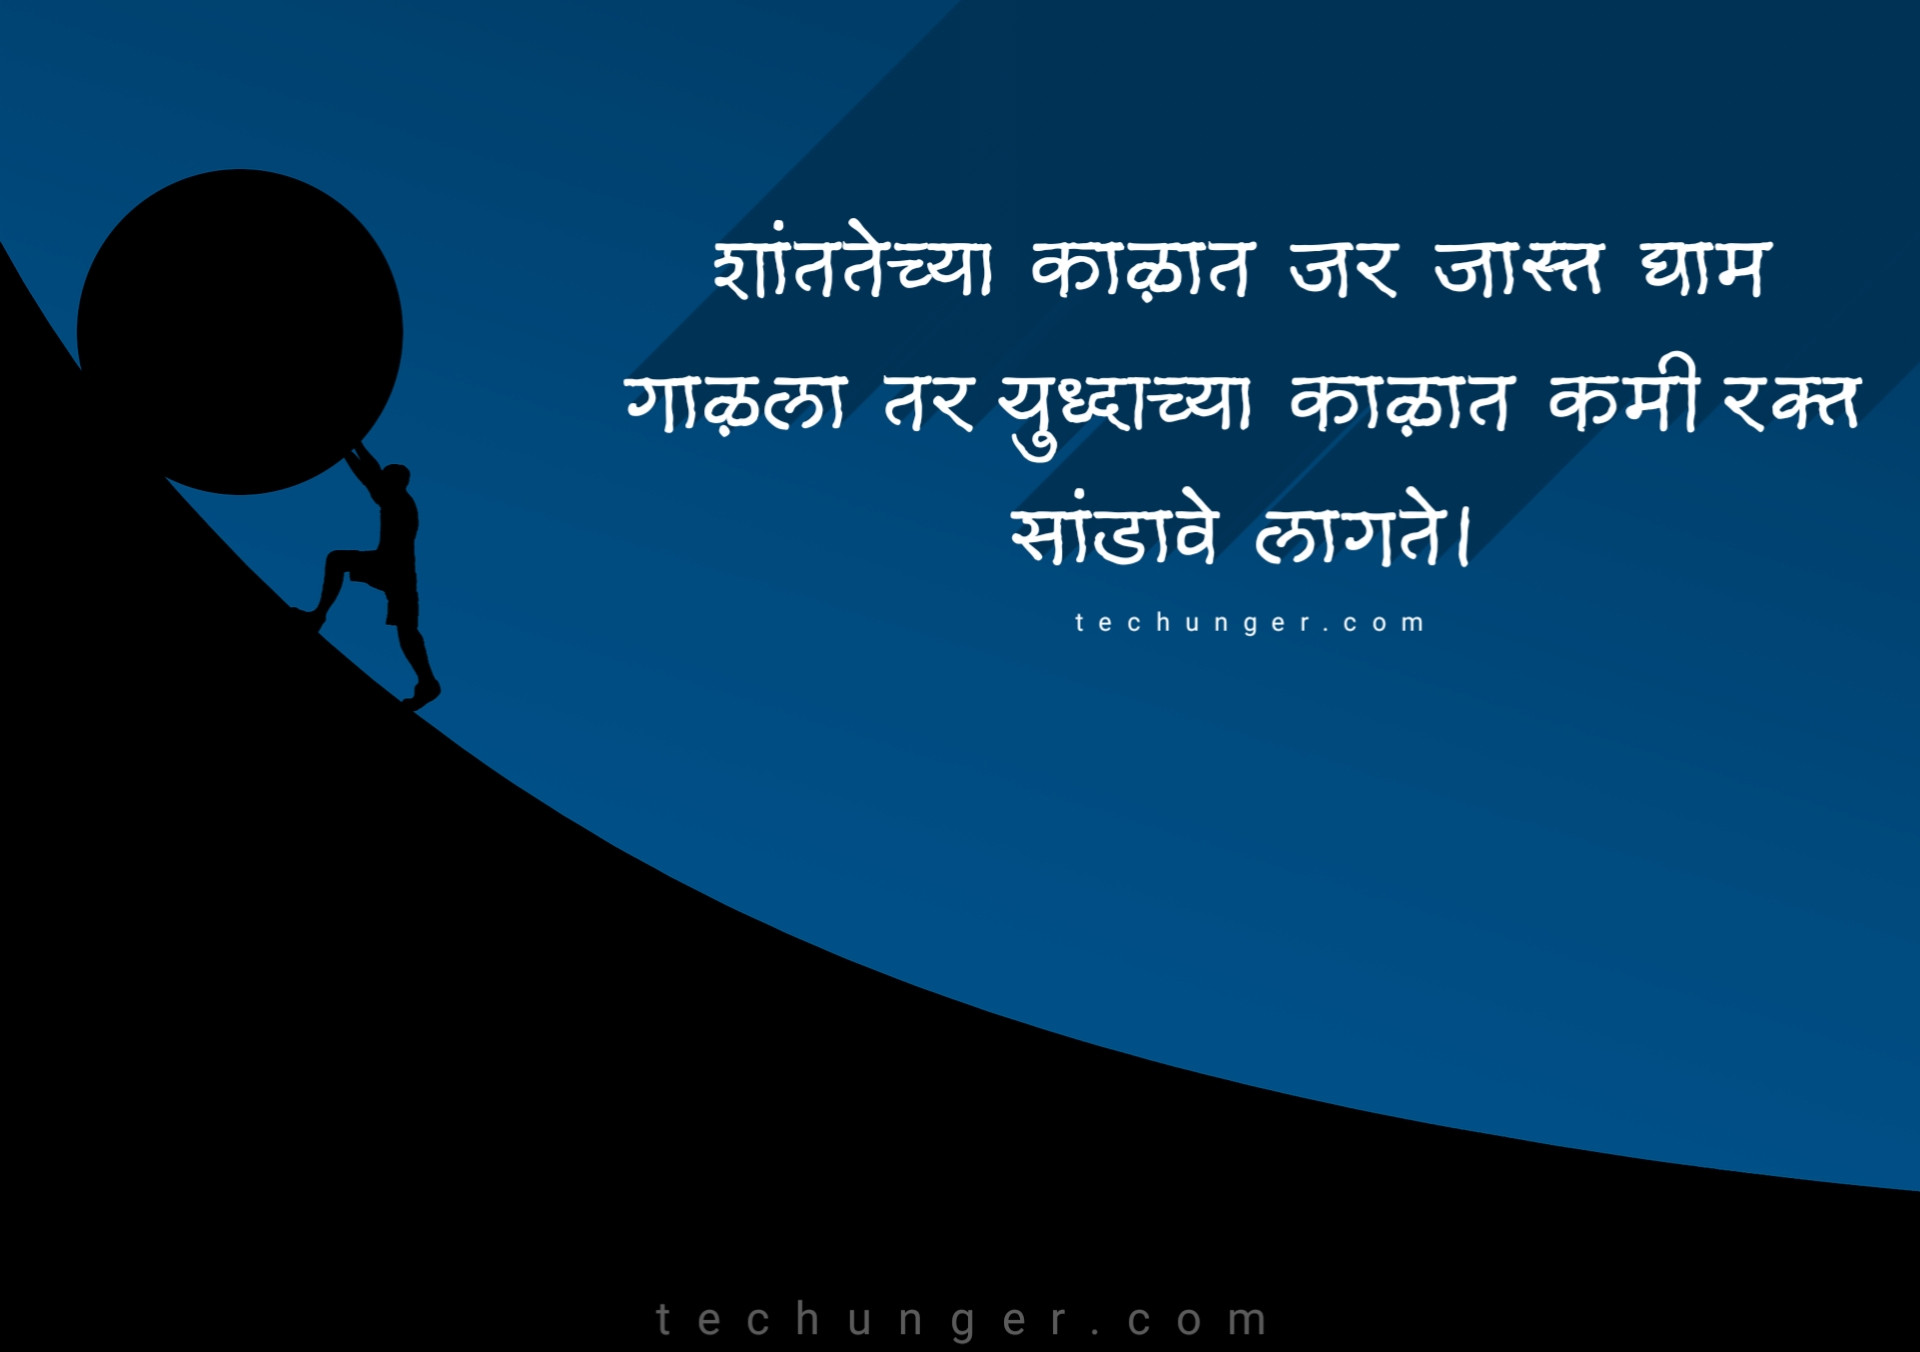 अस्सल मराठी सुविचार 2021 , marathi suvichar quotes 2021